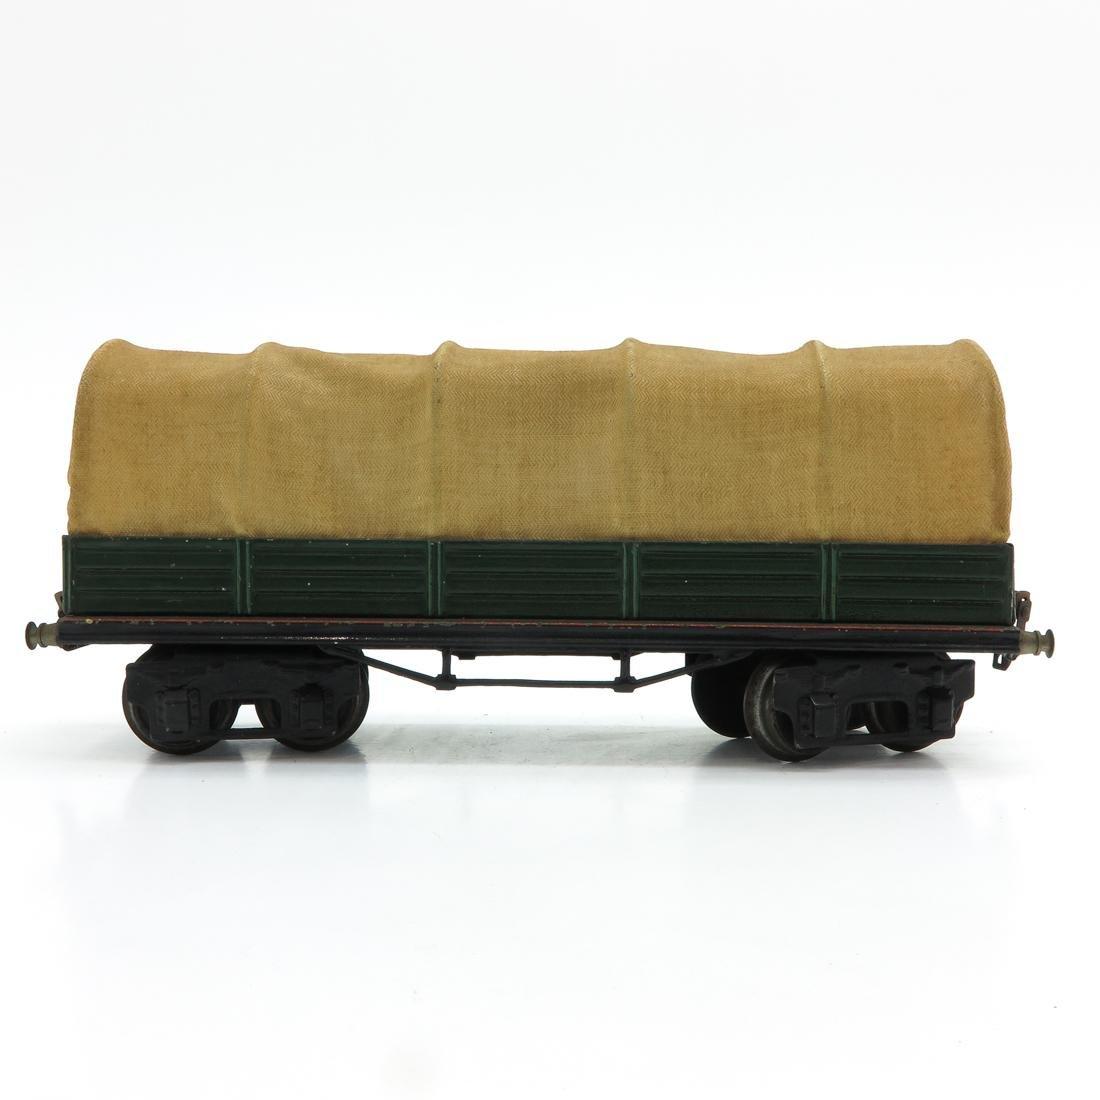 Vintage Marklin Covered Wagon